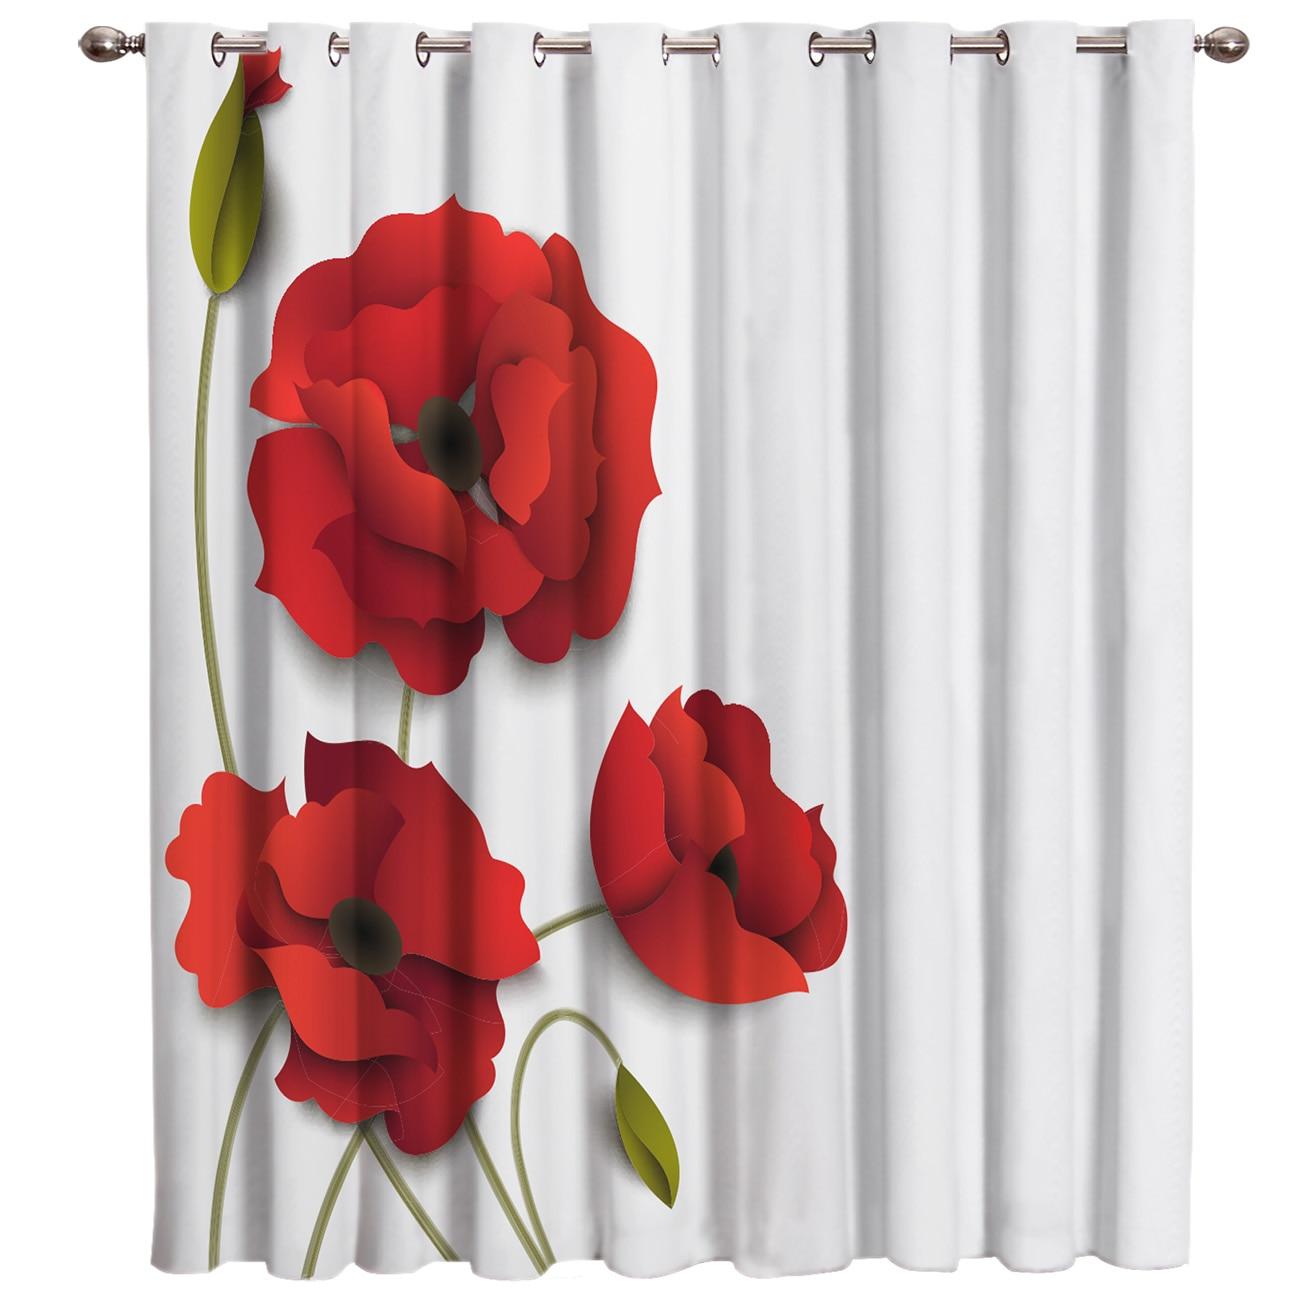 Red Poppy Flower Window Curtains Dark Living Room Bathroom Decor Bedroom Kids Window Treatment Ideas Outdoor Curtains Curtain Curtains Aliexpress